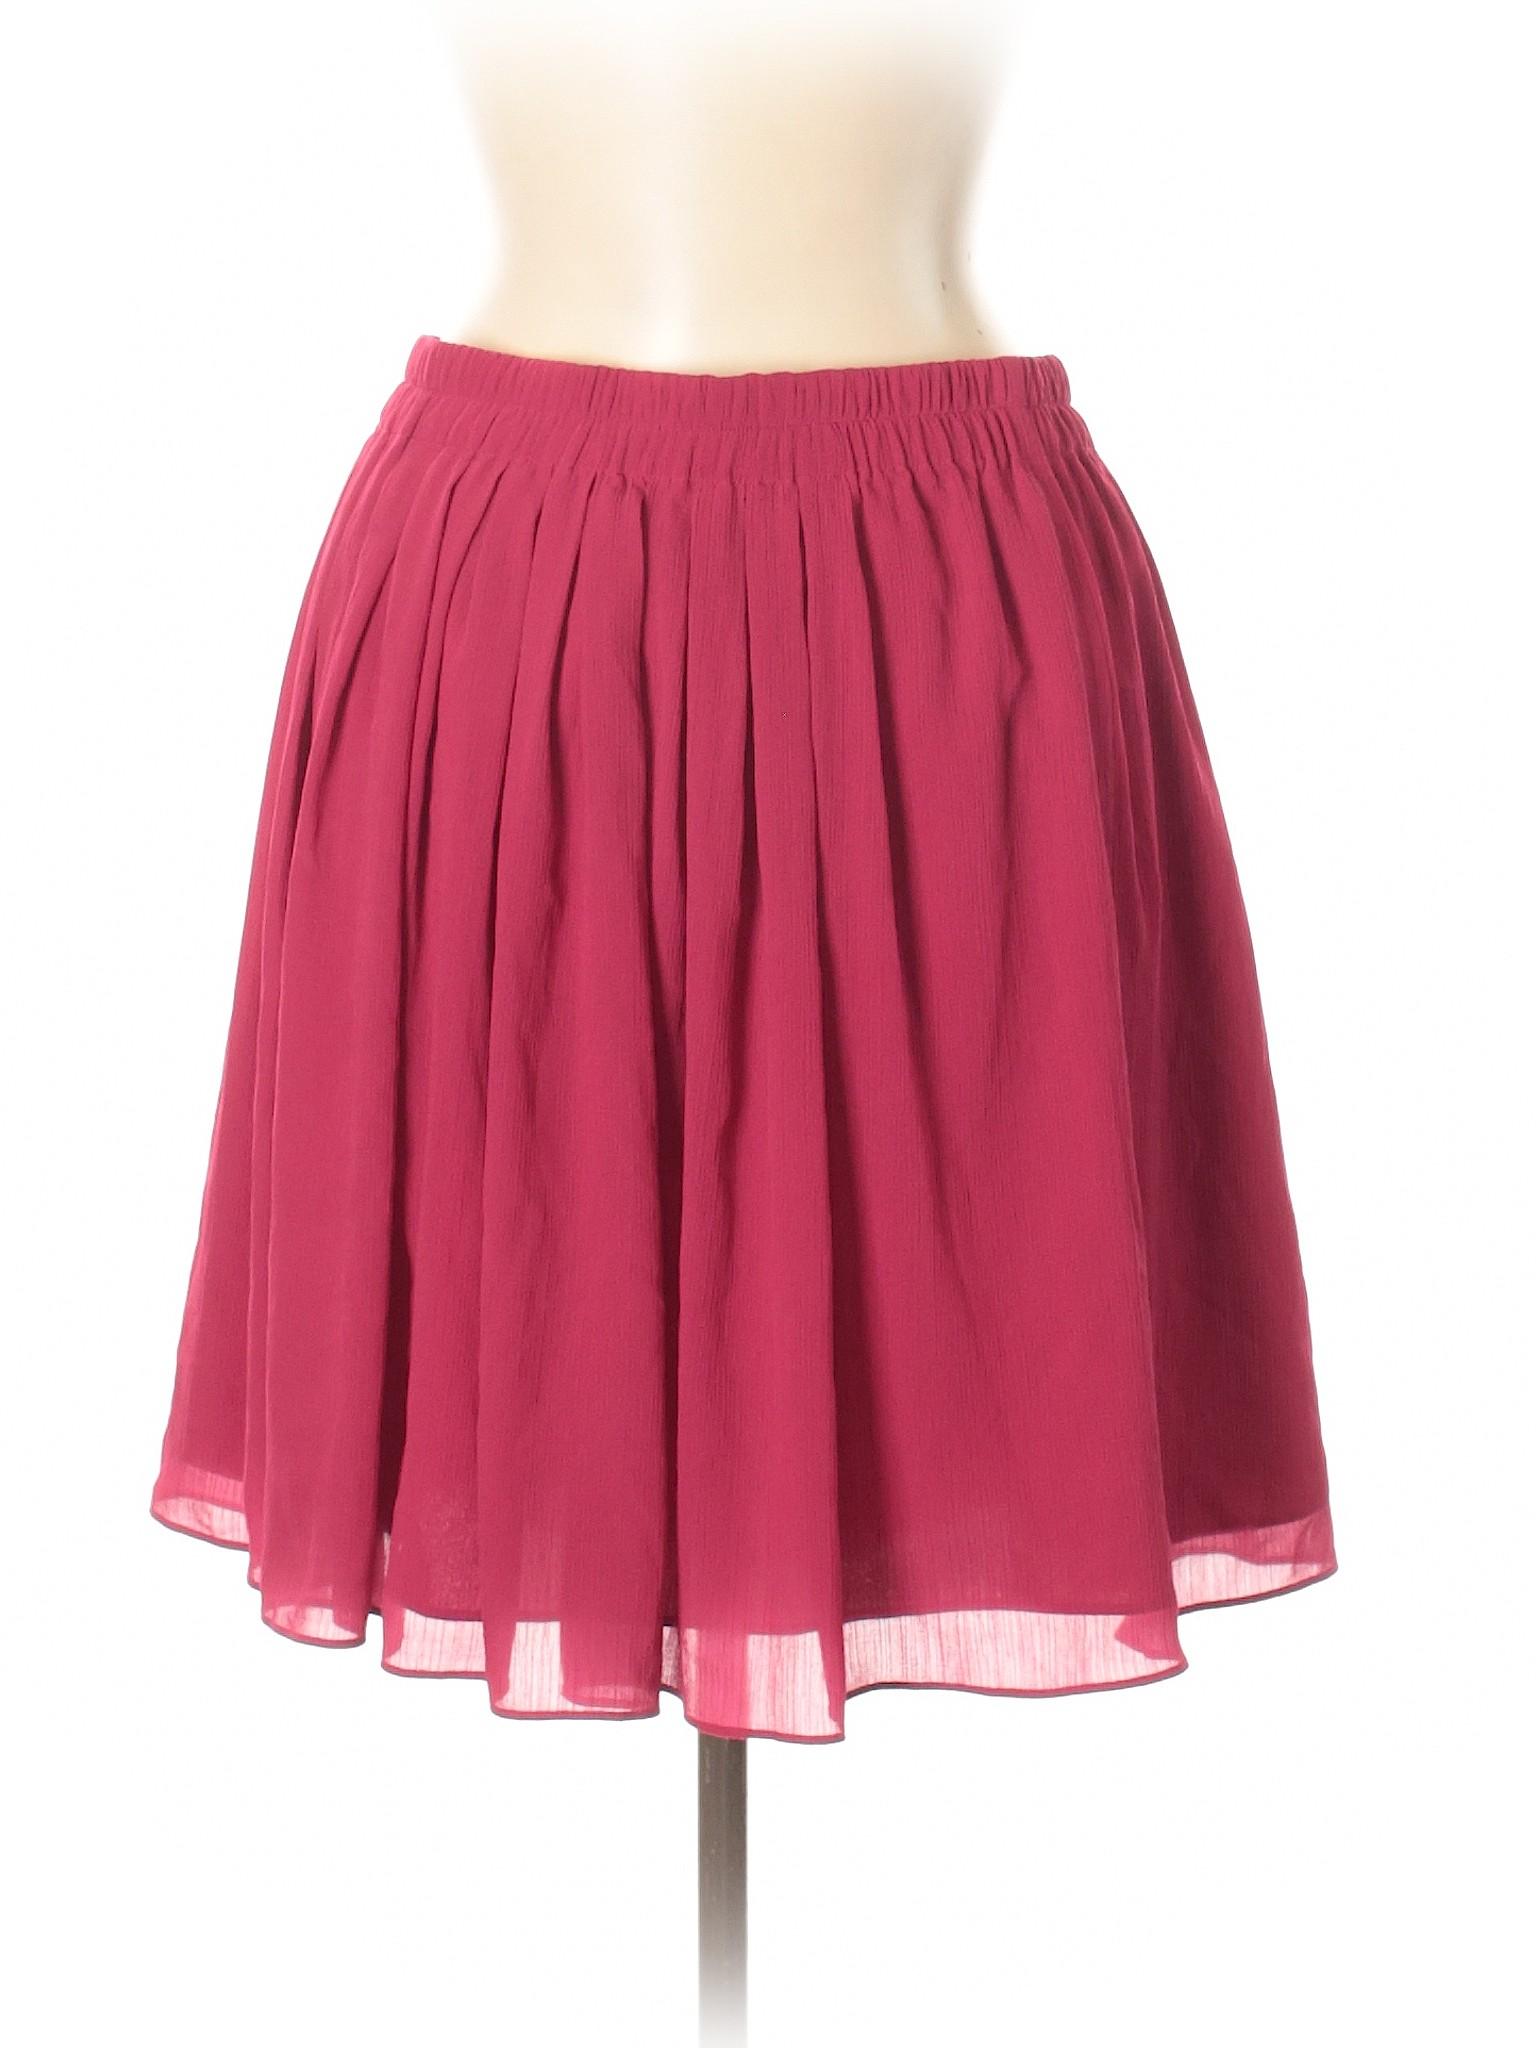 leisure Skirt LOFT Boutique Casual Ann Taylor dXq0U